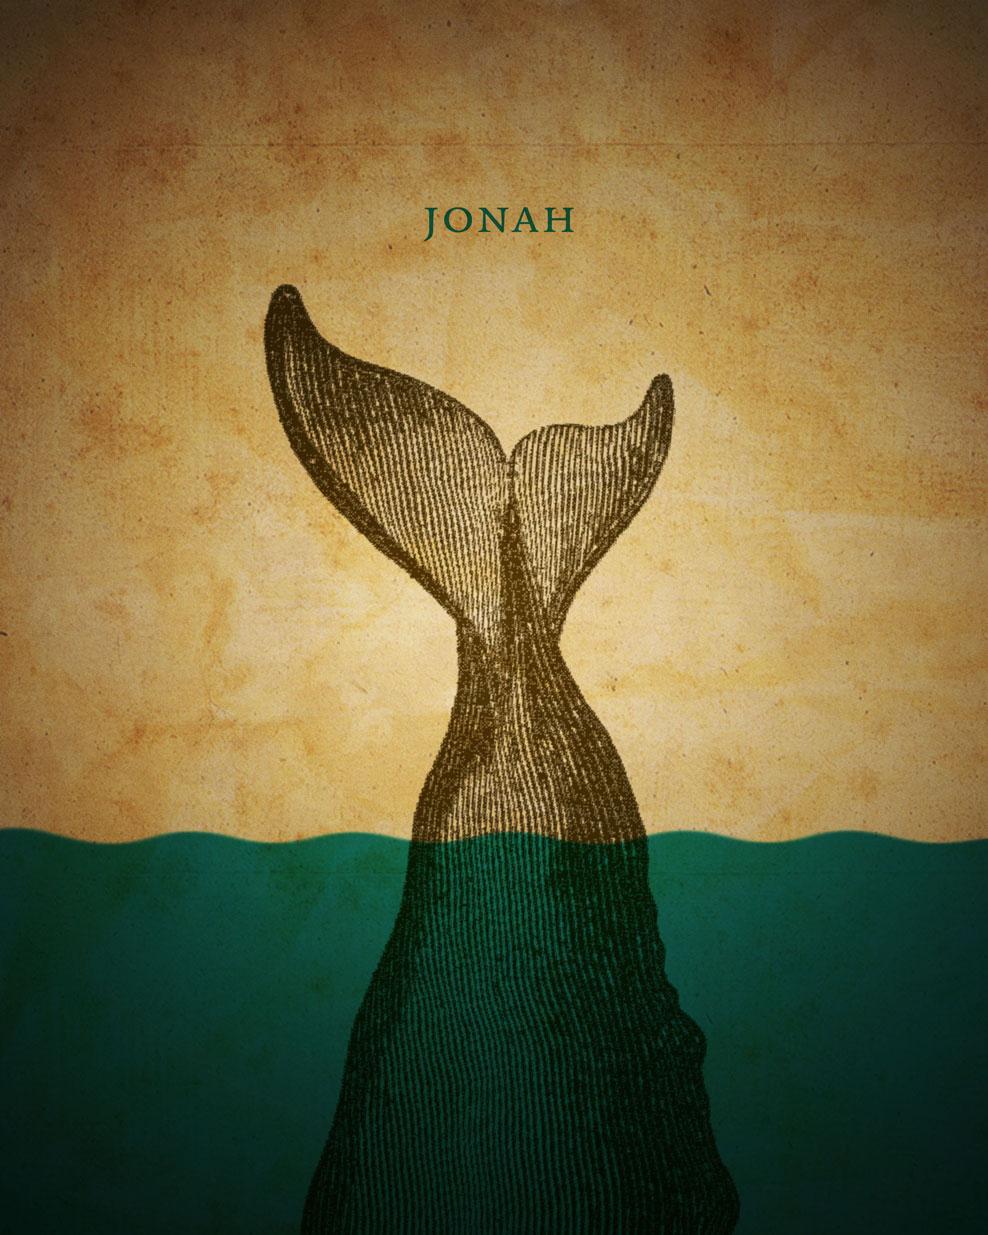 Jonahpic.jpg